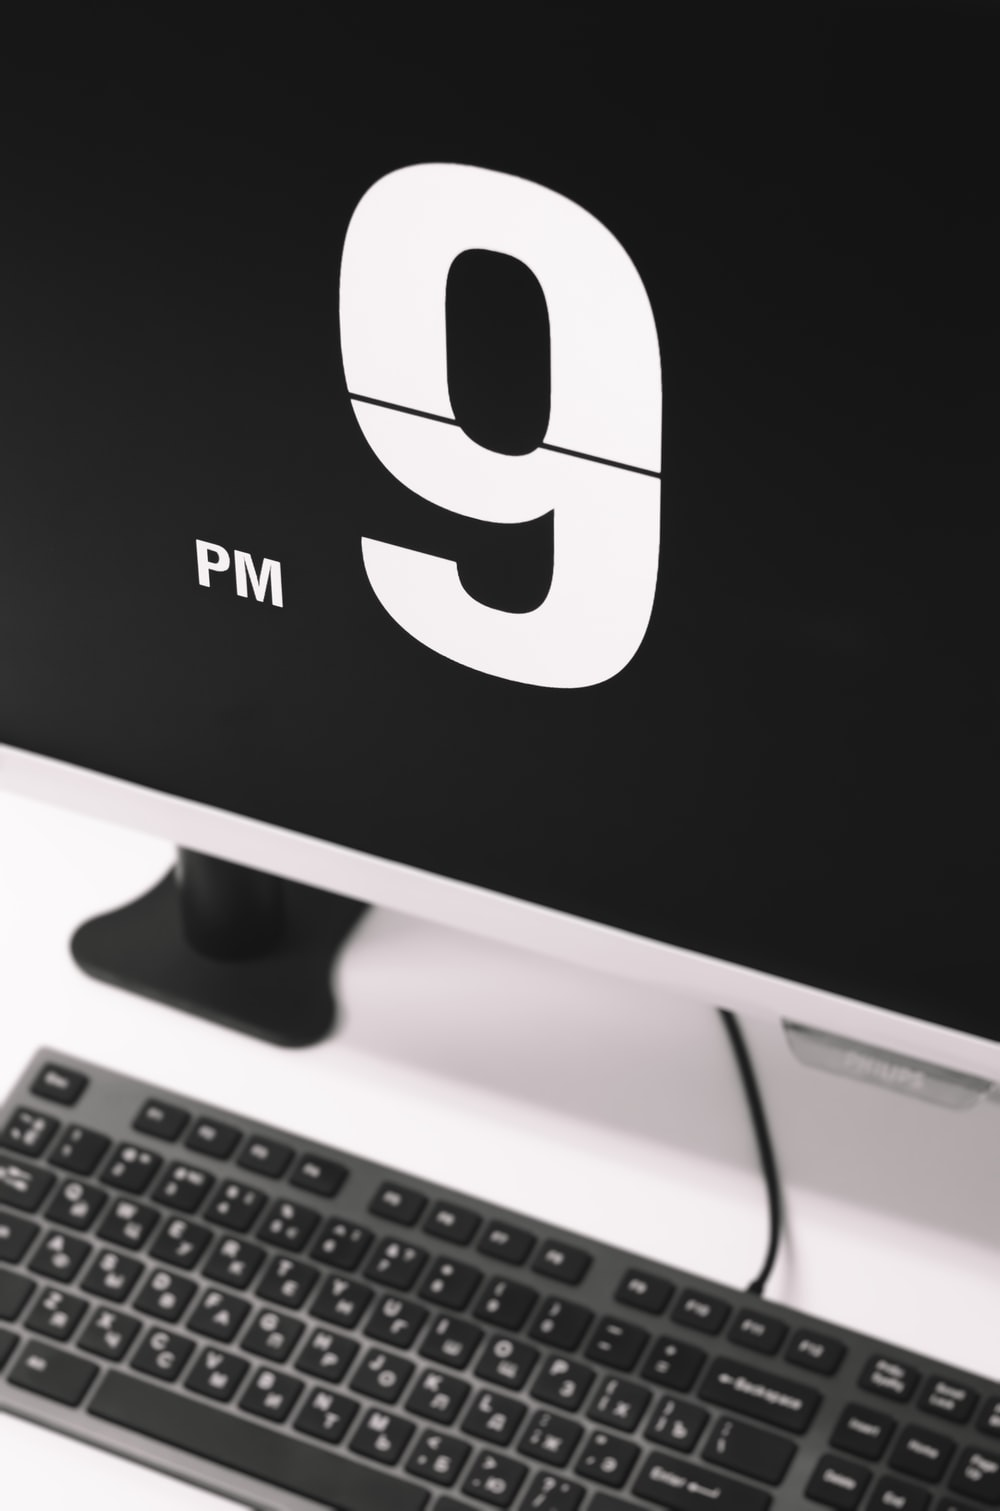 flat screen monitor displaying 9 PM